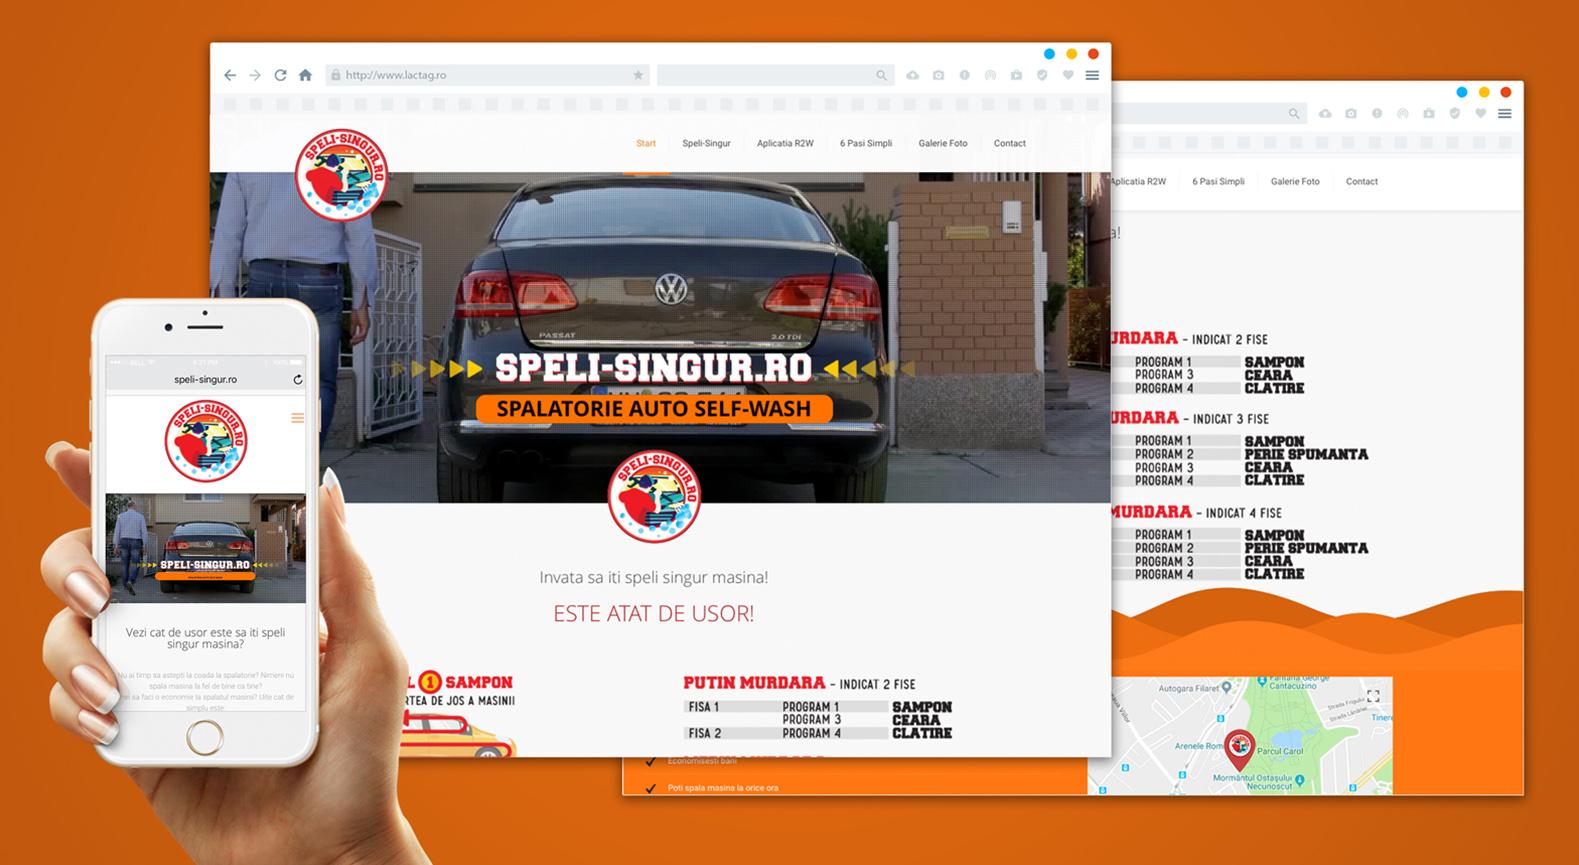 tudor_deleanu_creative_design_art_advertising_web_website__0005_Speli Singur